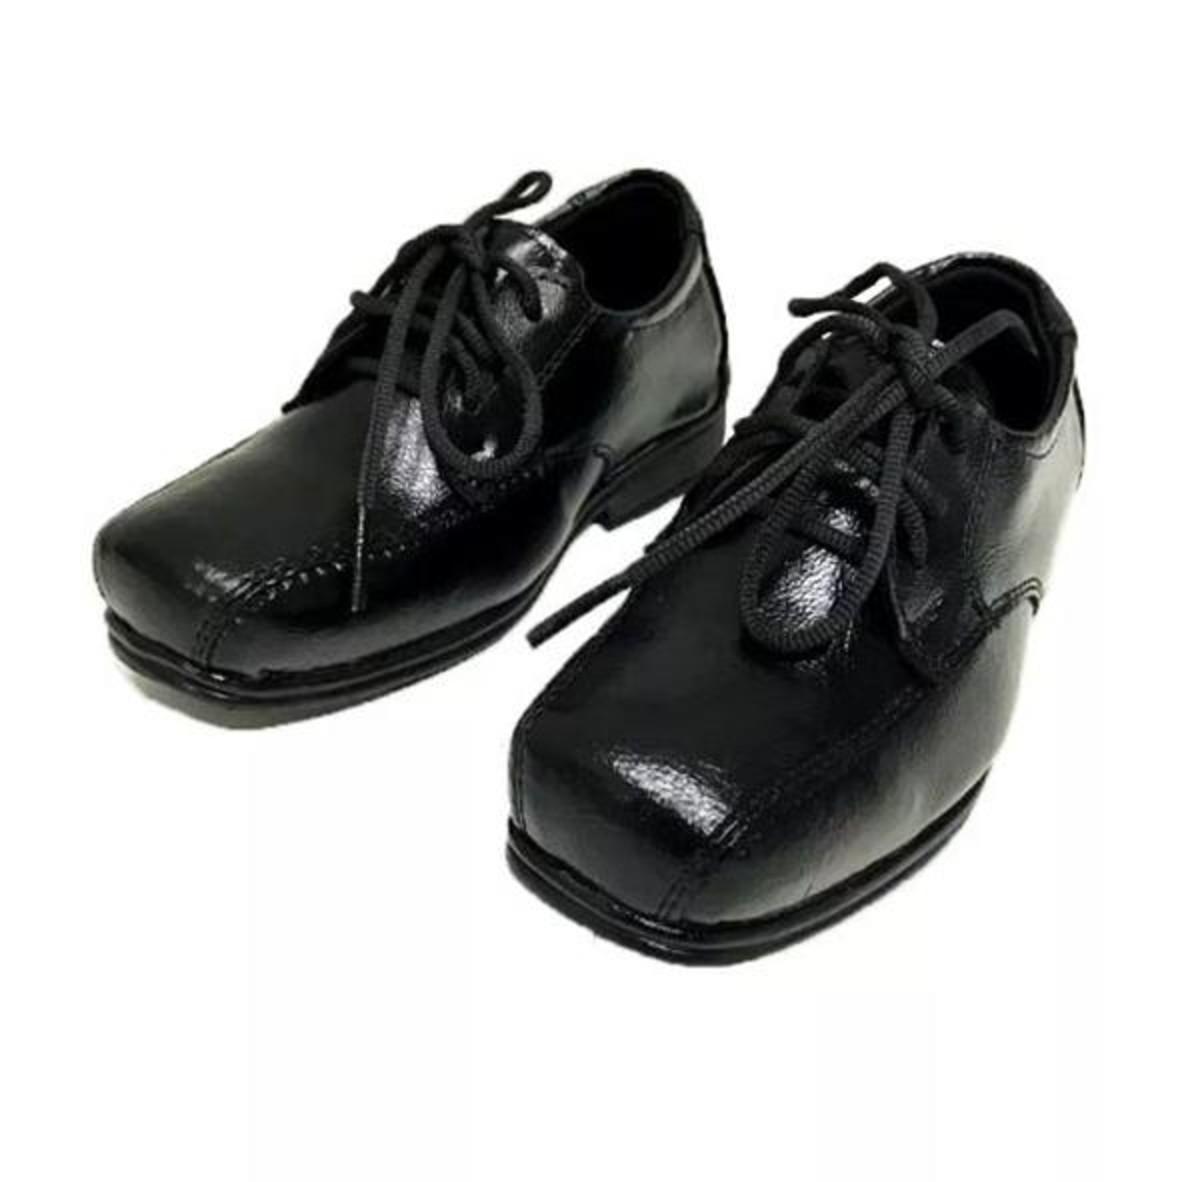 49bbdd10b3 Sapato Social Infantil Masculino C Cadarço Couro Sintético no Elo7 ...